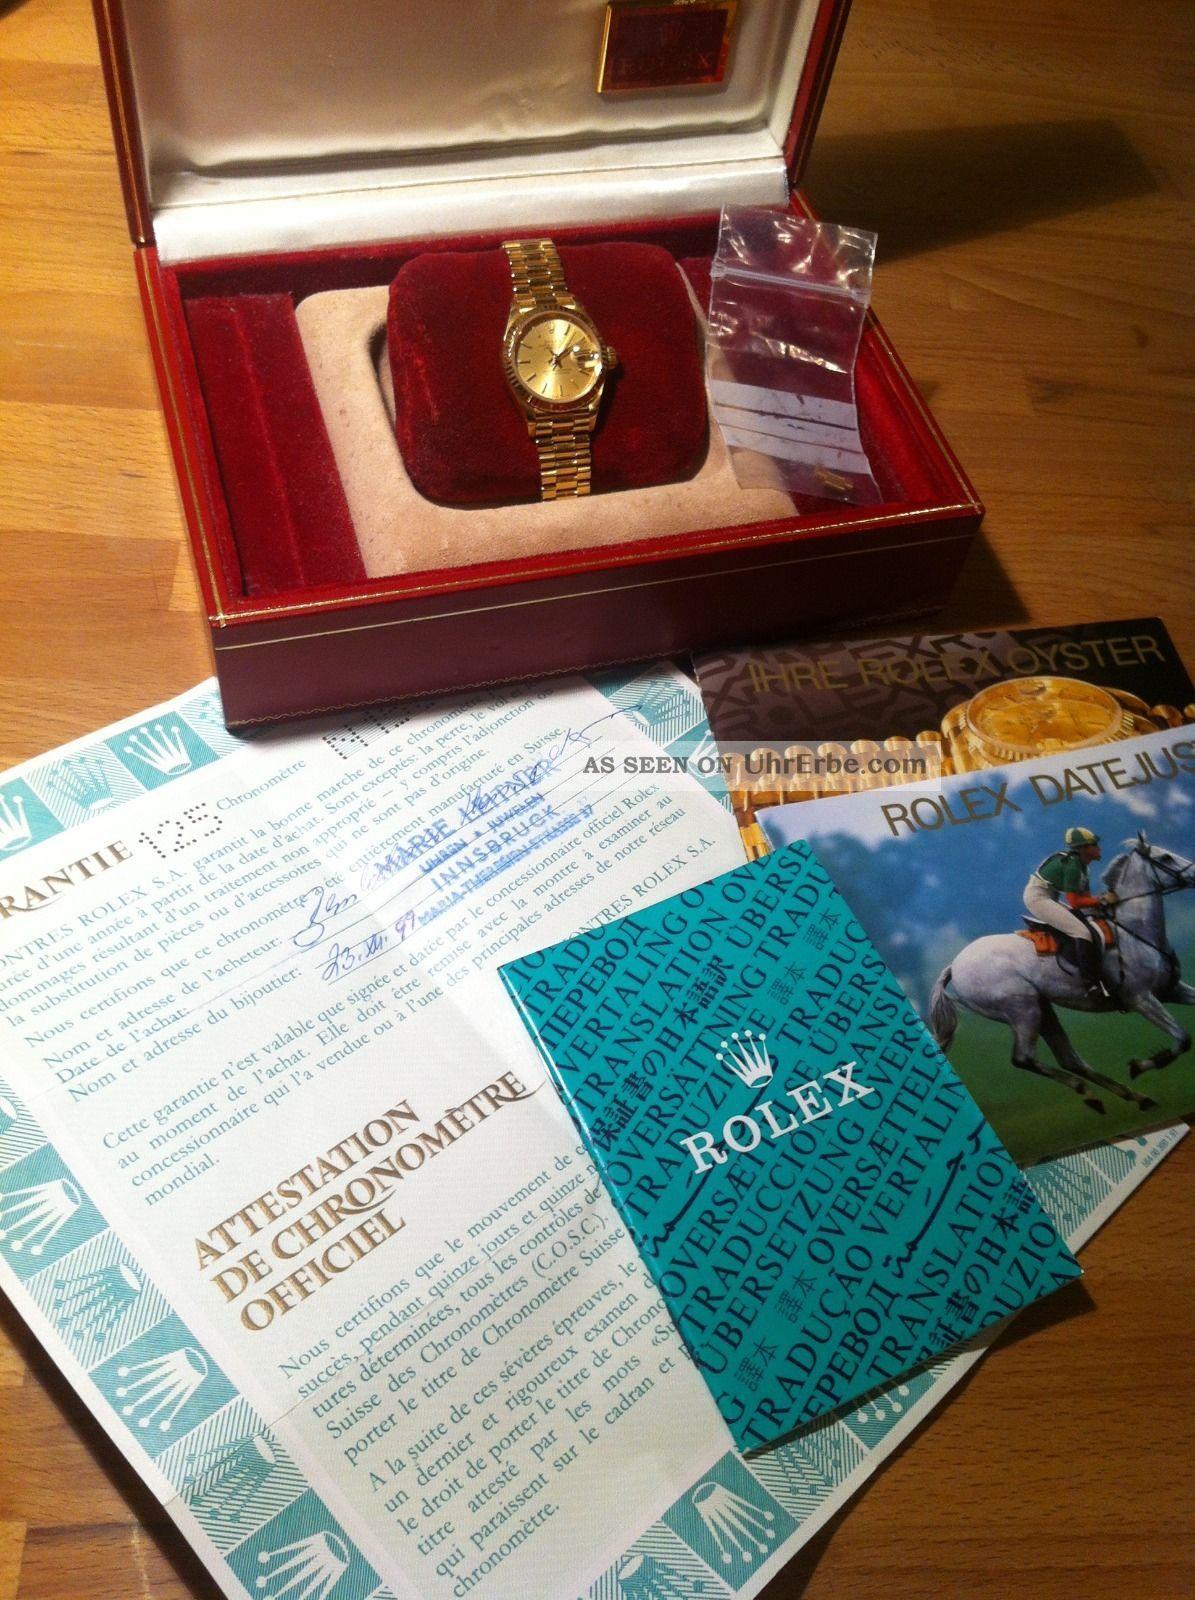 Rolex Oyster Perpetual Datejust Damen Armbanduhr 18 Karat Gold 69178 Armbanduhren Bild